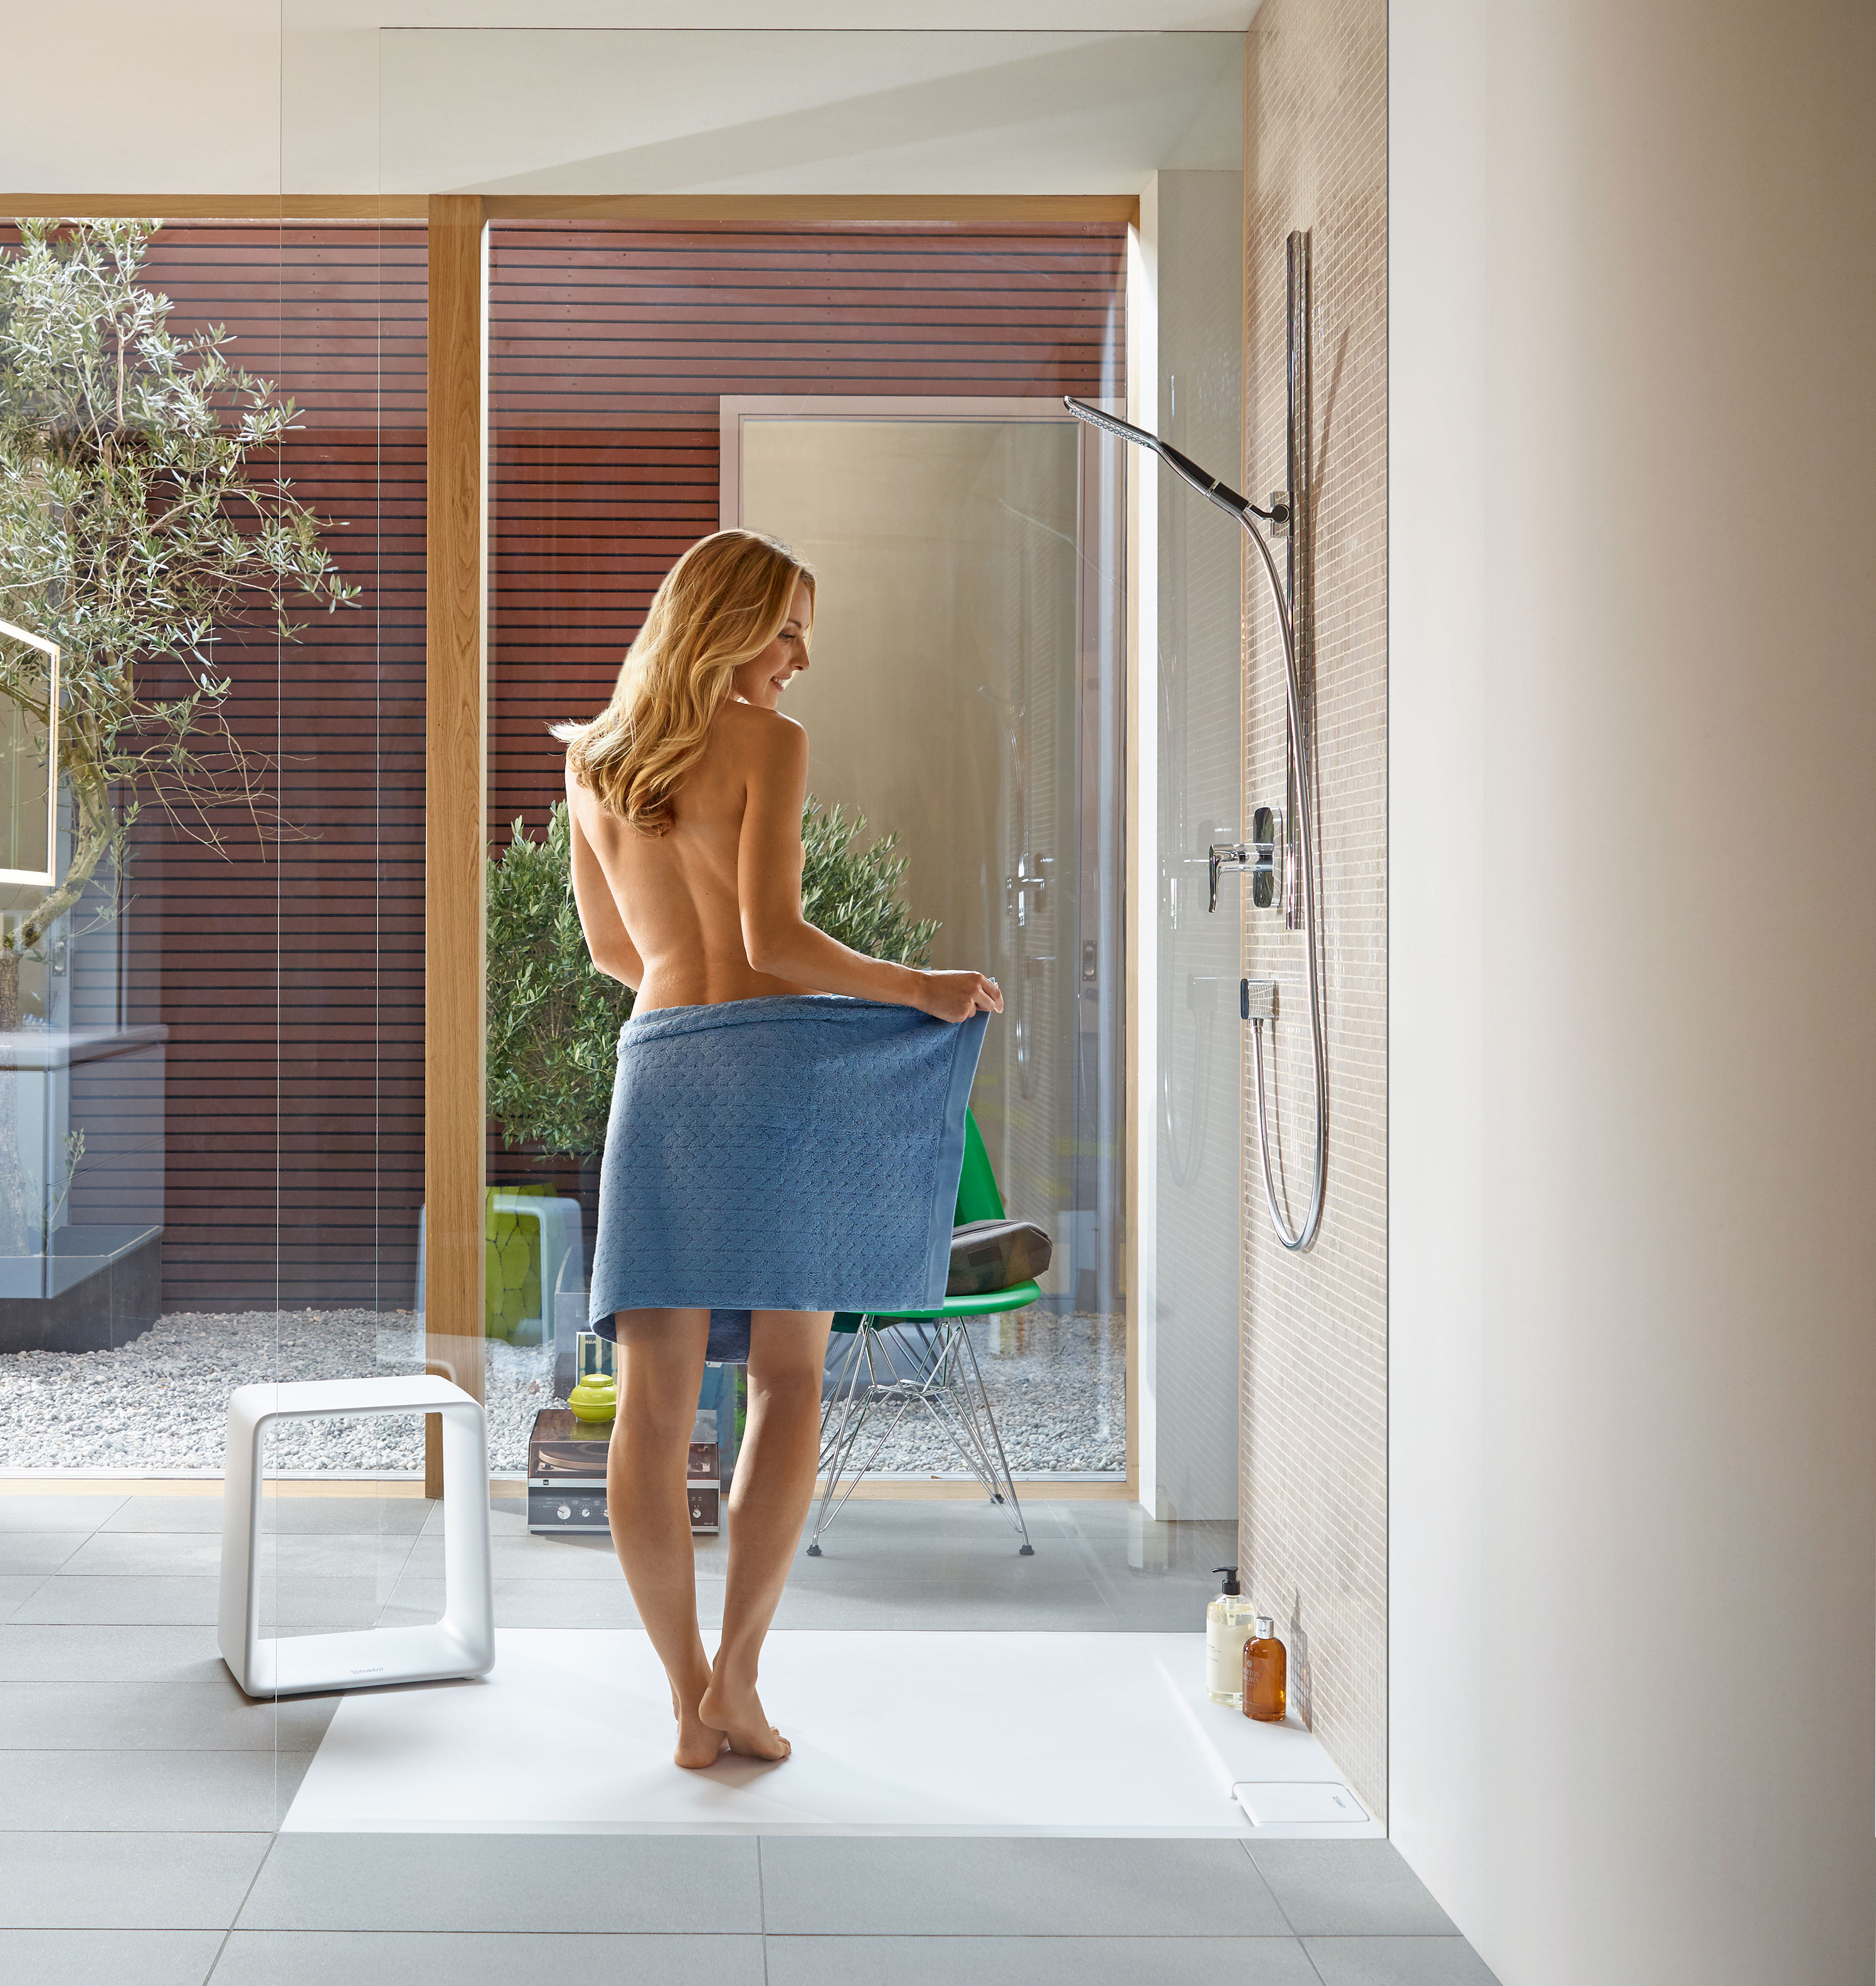 Duschabtrennung duschtrennwand aus glas duravit for Platos de ducha a ras de suelo